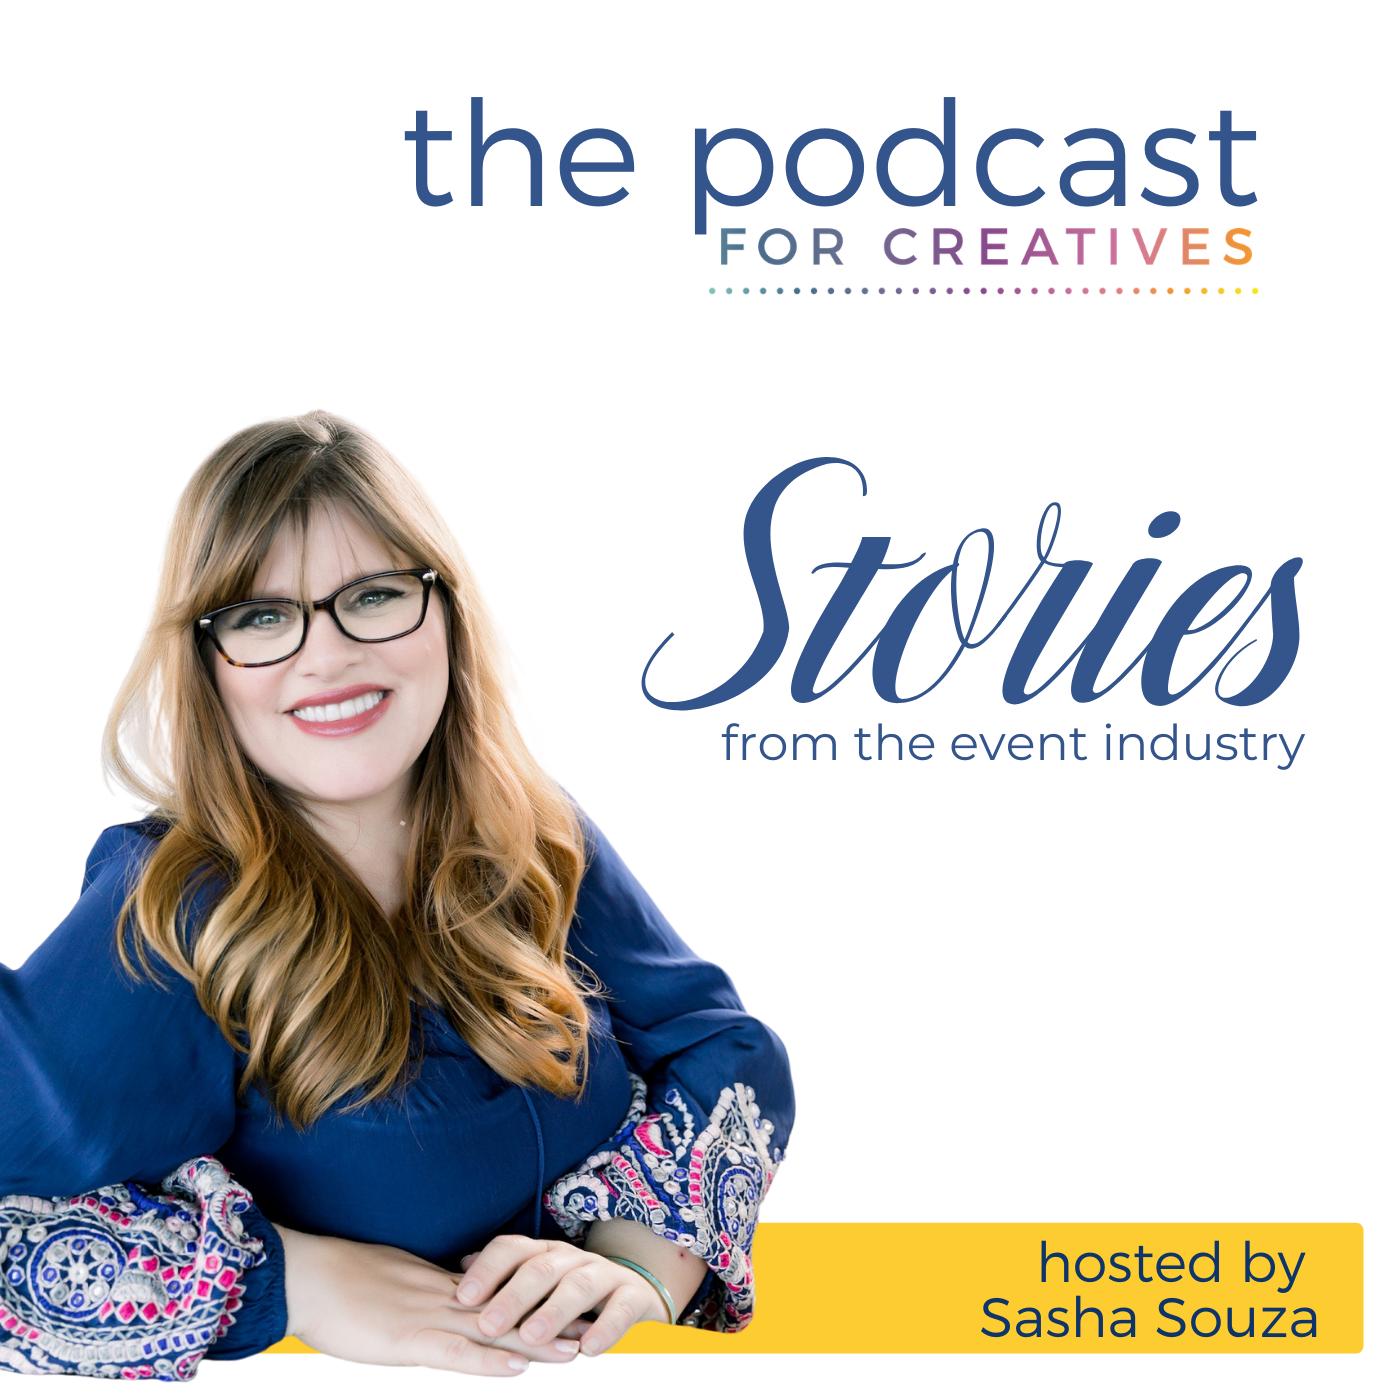 Sasha Souza's Podcast for Creatives